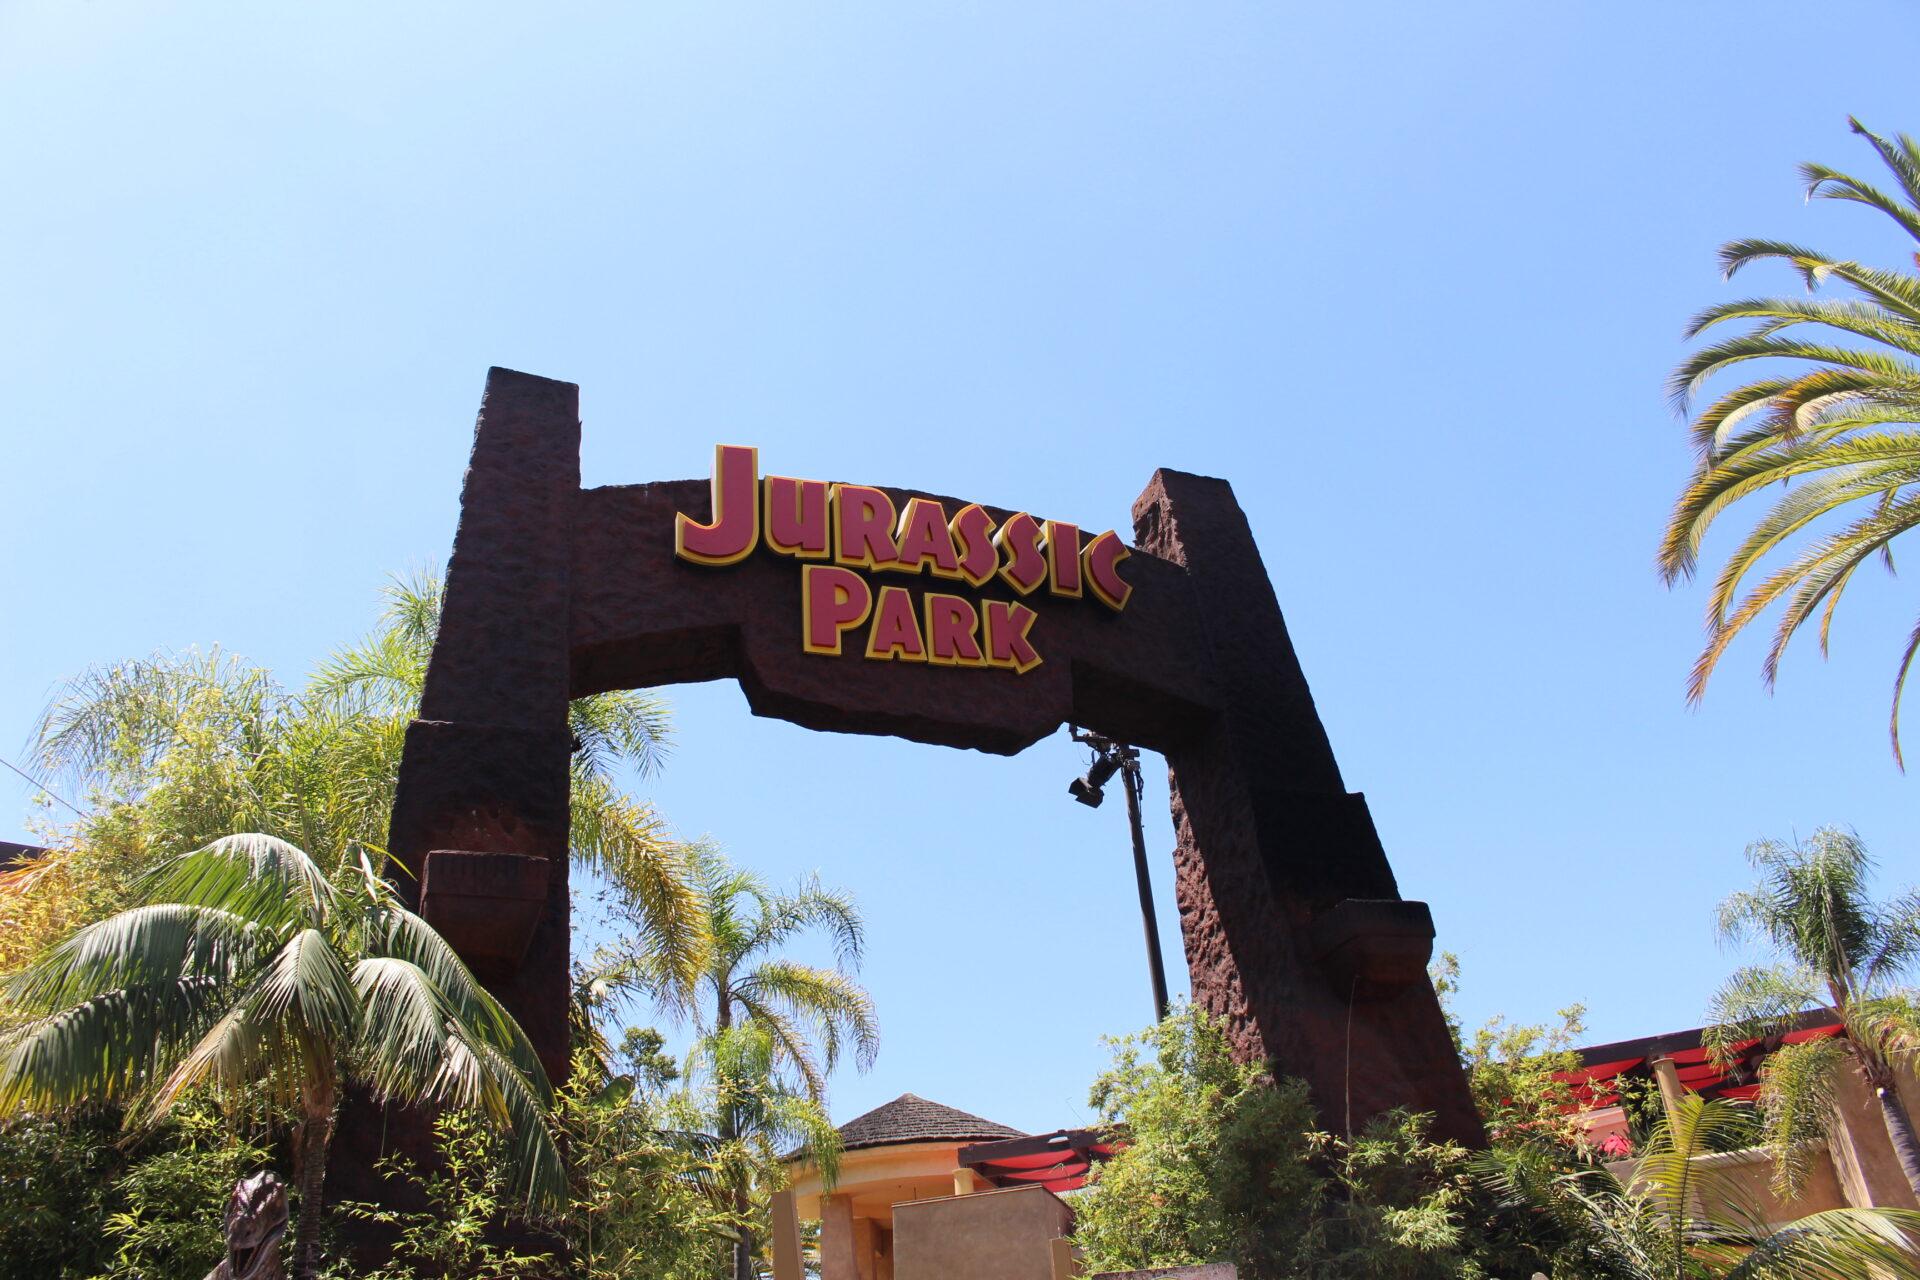 Universal Studios Hollywood - Jurassic Park